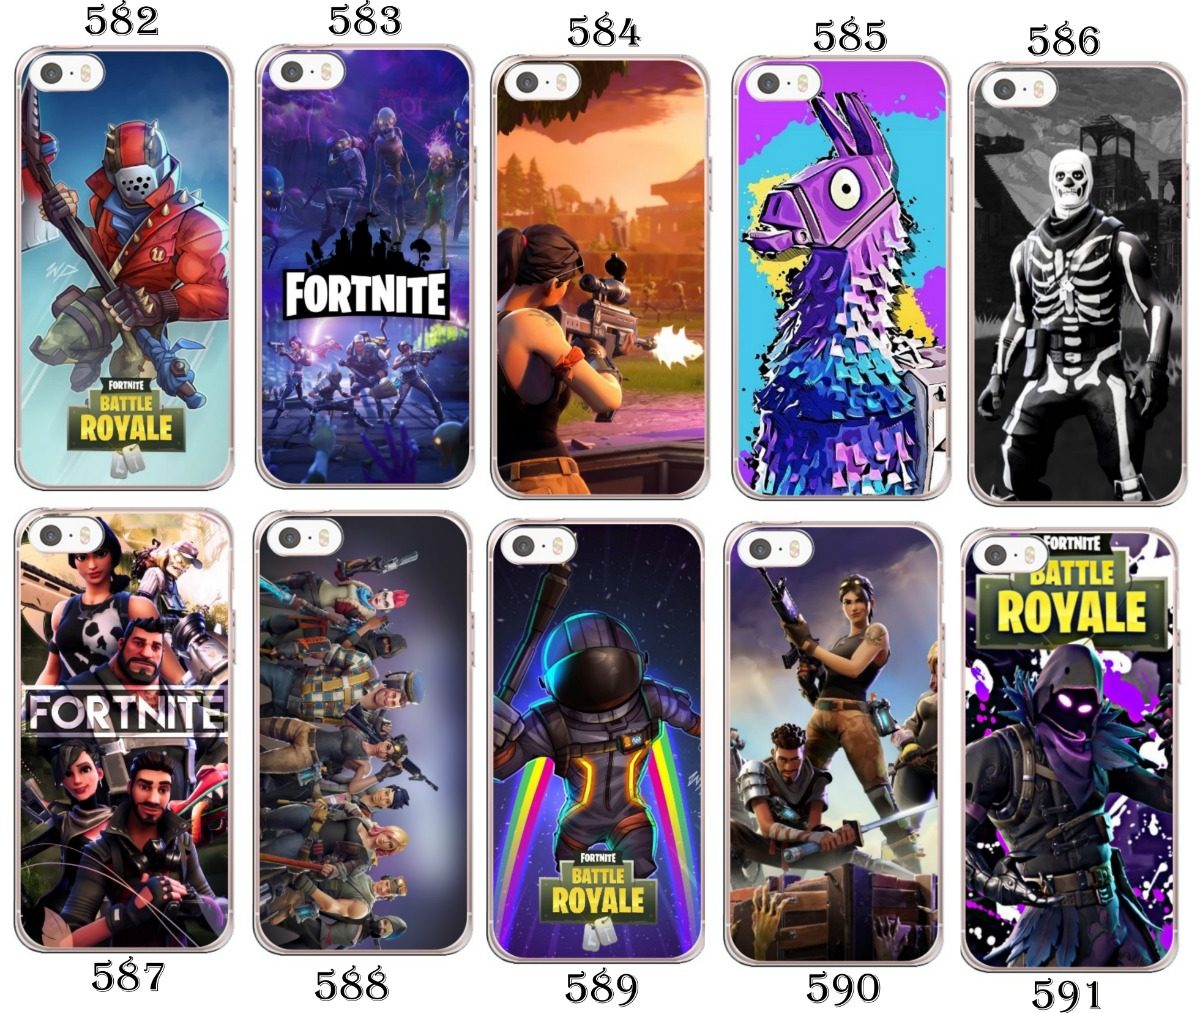 new styles 9ab6f b4a41 Capinha Capa Fortnite Battle Royale - Iphone 4 5 5s 5c